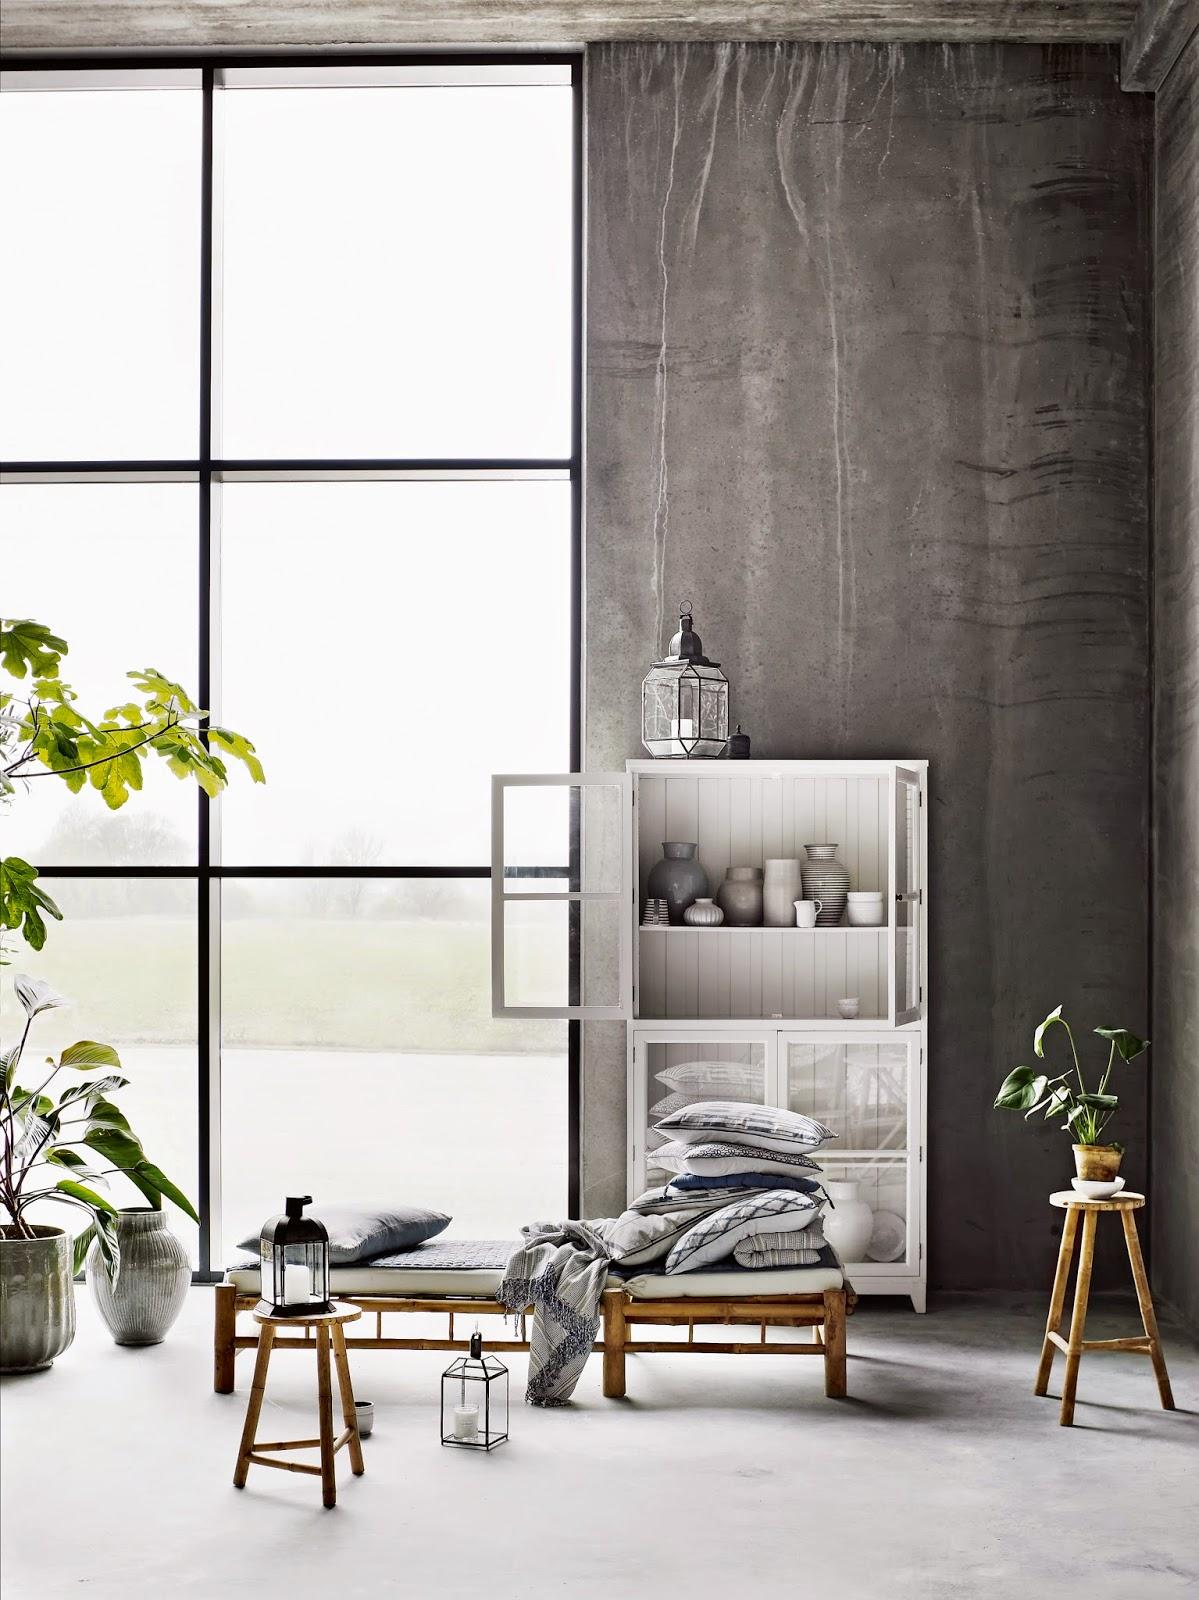 Tine K Home s/s15 trend-daily blog, caroline davis